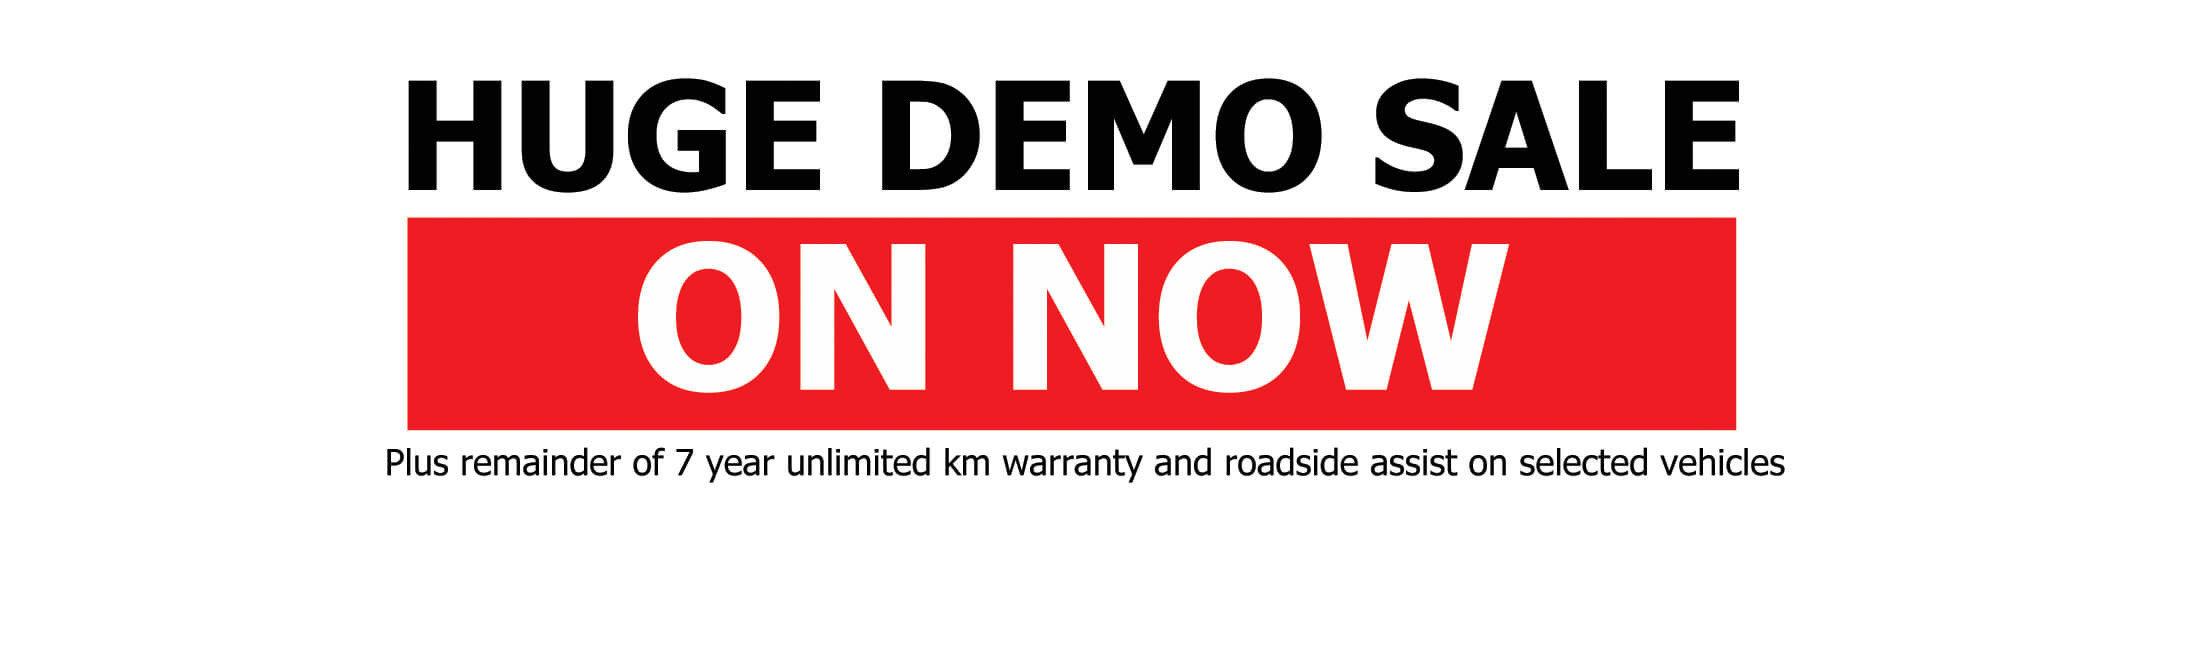 Nordic Honda - Demo Sale